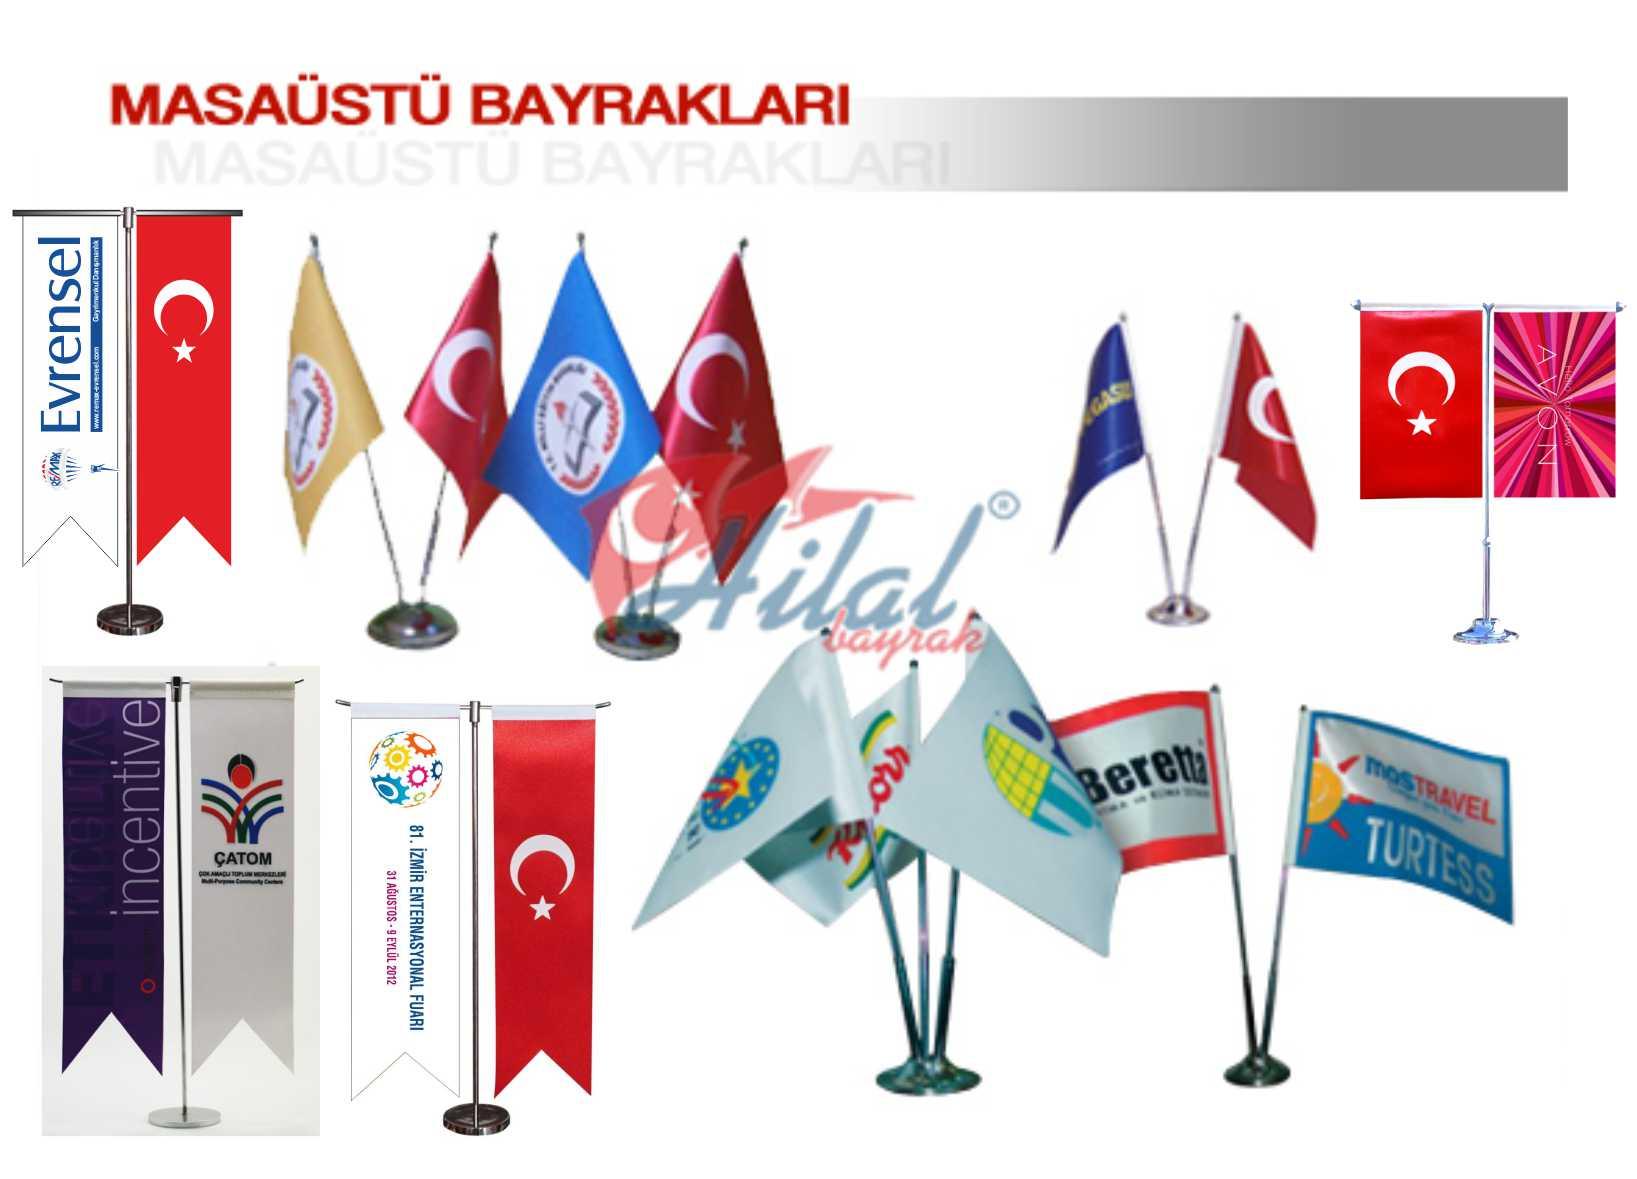 Masa Bayrak İstanbul, masa bayrak, satışı, masa bayrak Ümraniye, masa bayrak imalatı, acil masa bayrağı, masa bayrakları, masa bayrak burada satışı ACİL 7.24 SAAT AÇIK HİZMET FLAMA BAYRAK